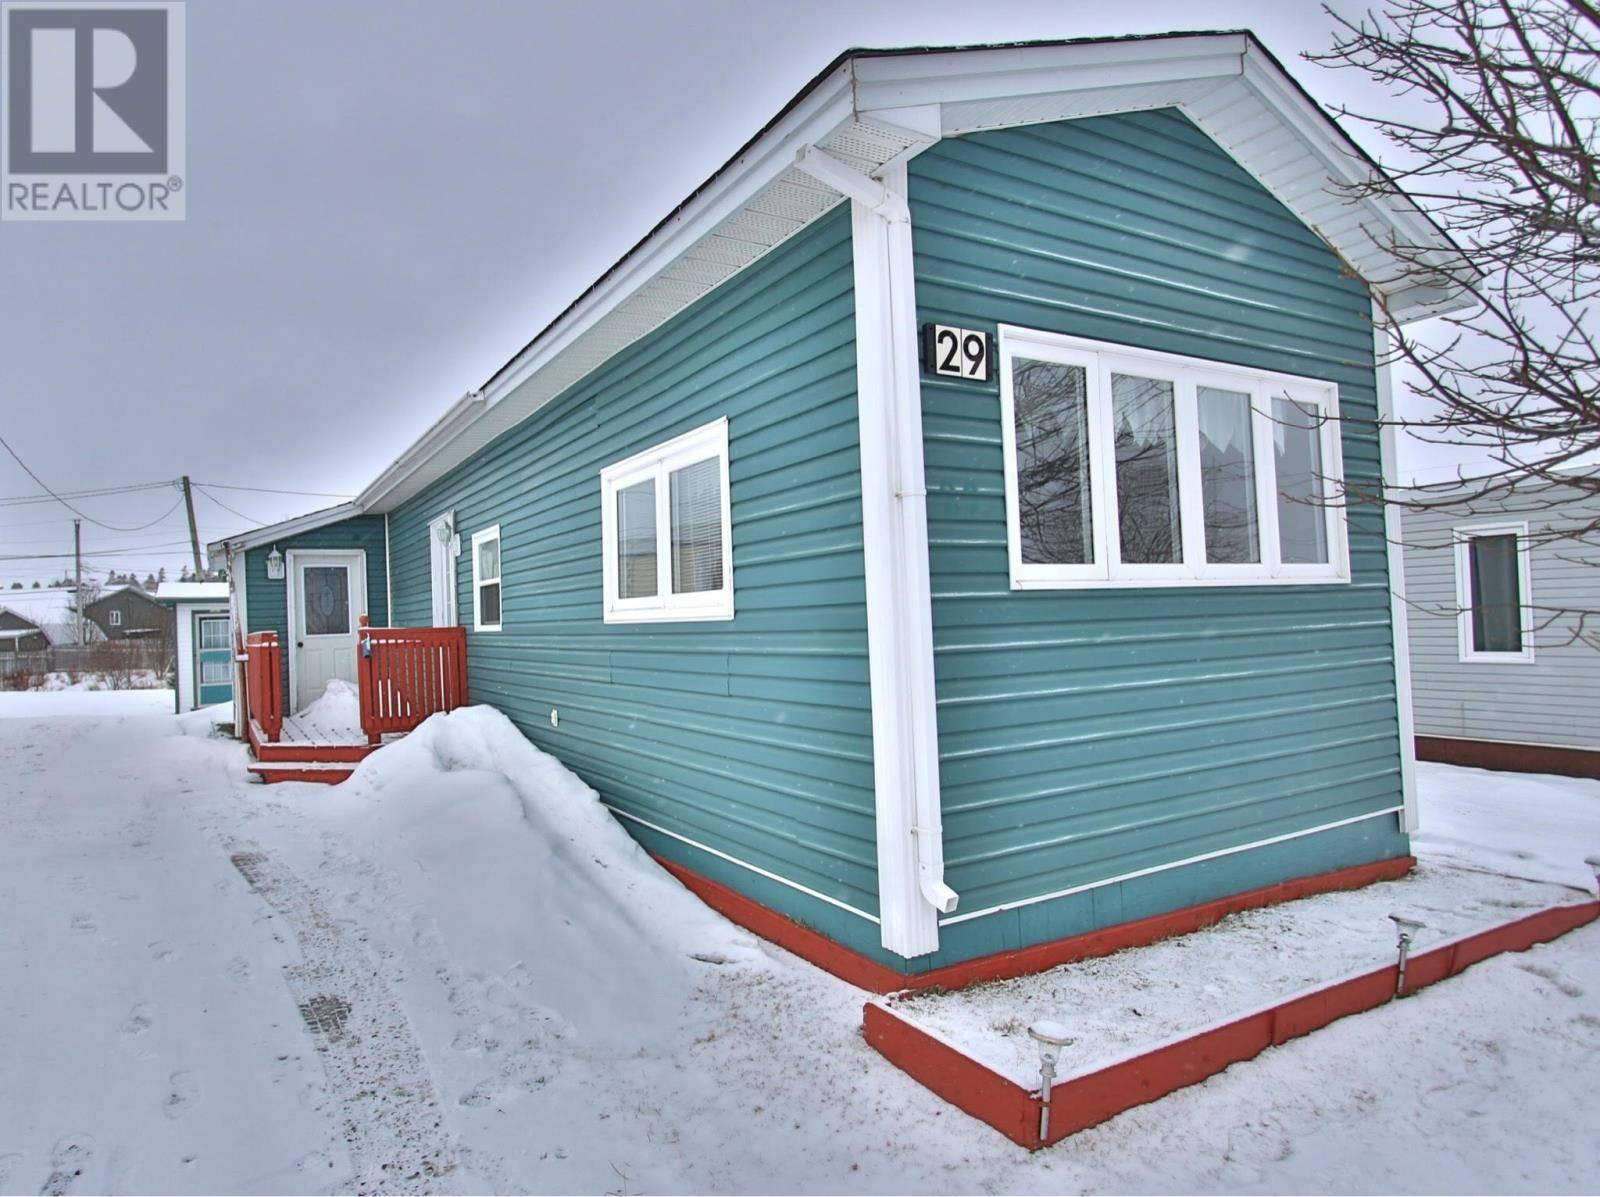 Residential property for sale at 29 Meadowbrook Park Dr St.  John's Newfoundland - MLS: 1209264